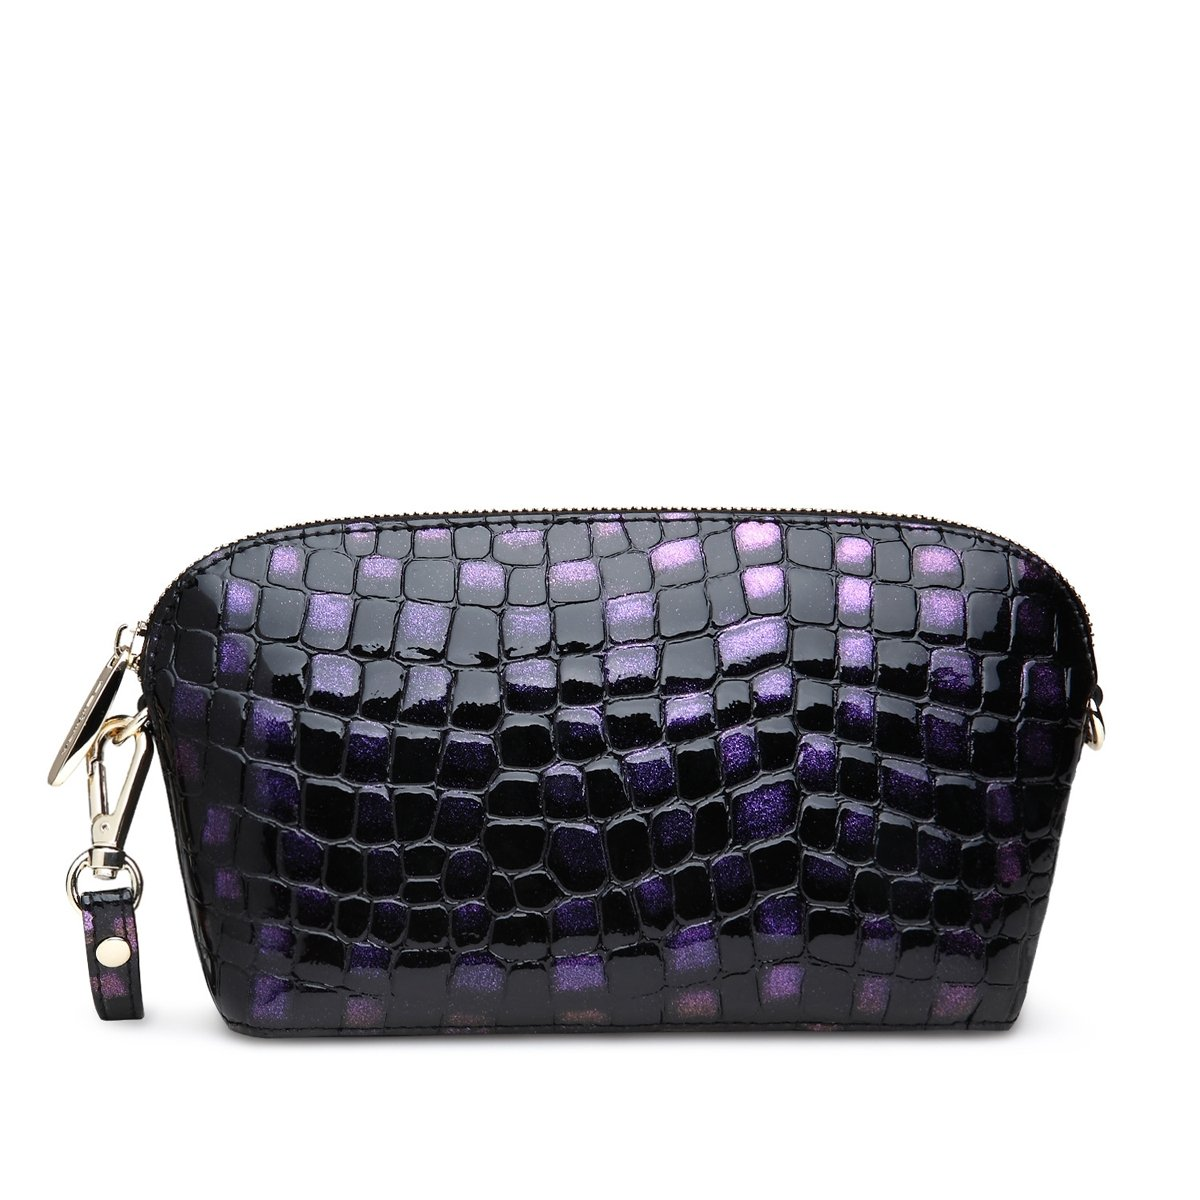 Black Purple Luxury Cowhide Genuine Leather Lady Evening Clutch Handle Bag Elegant Embossed Alligator Sea Shell Shoulder Bag